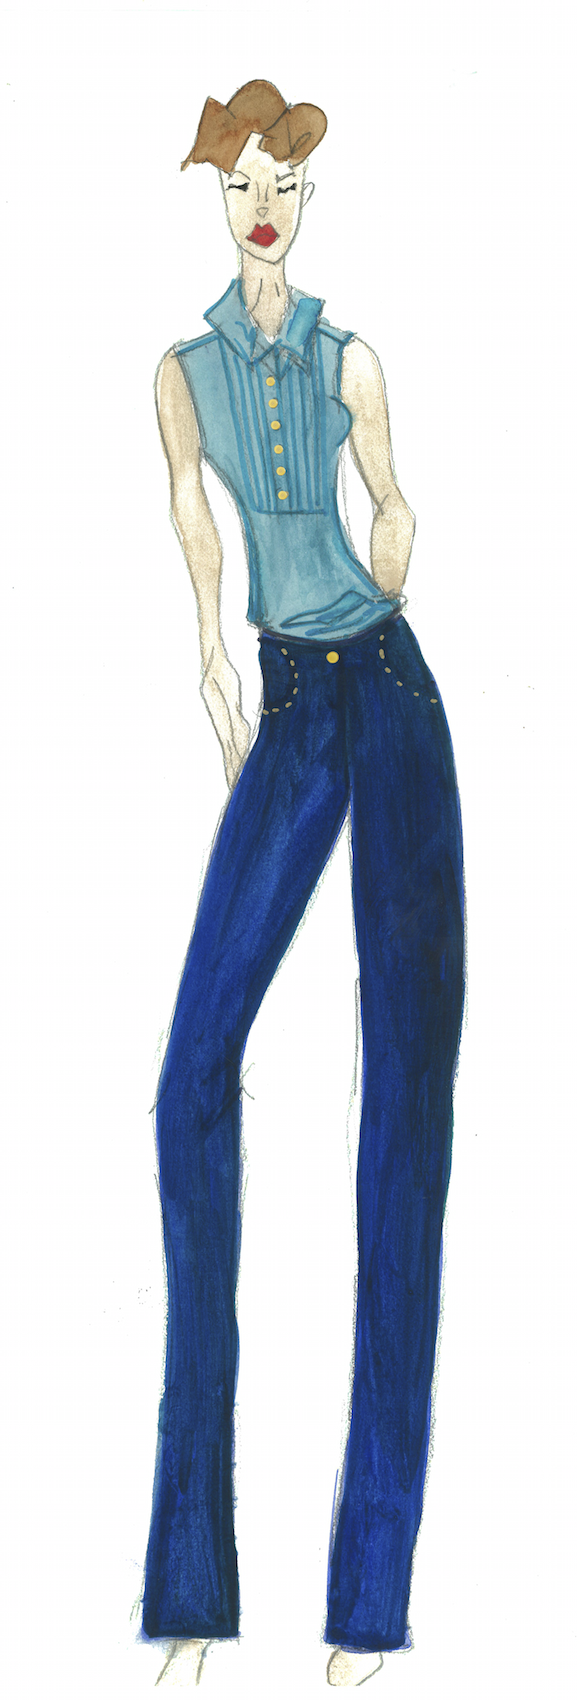 Meg Campbell Fashion Sketch with light blue vest and dark blue golf pants